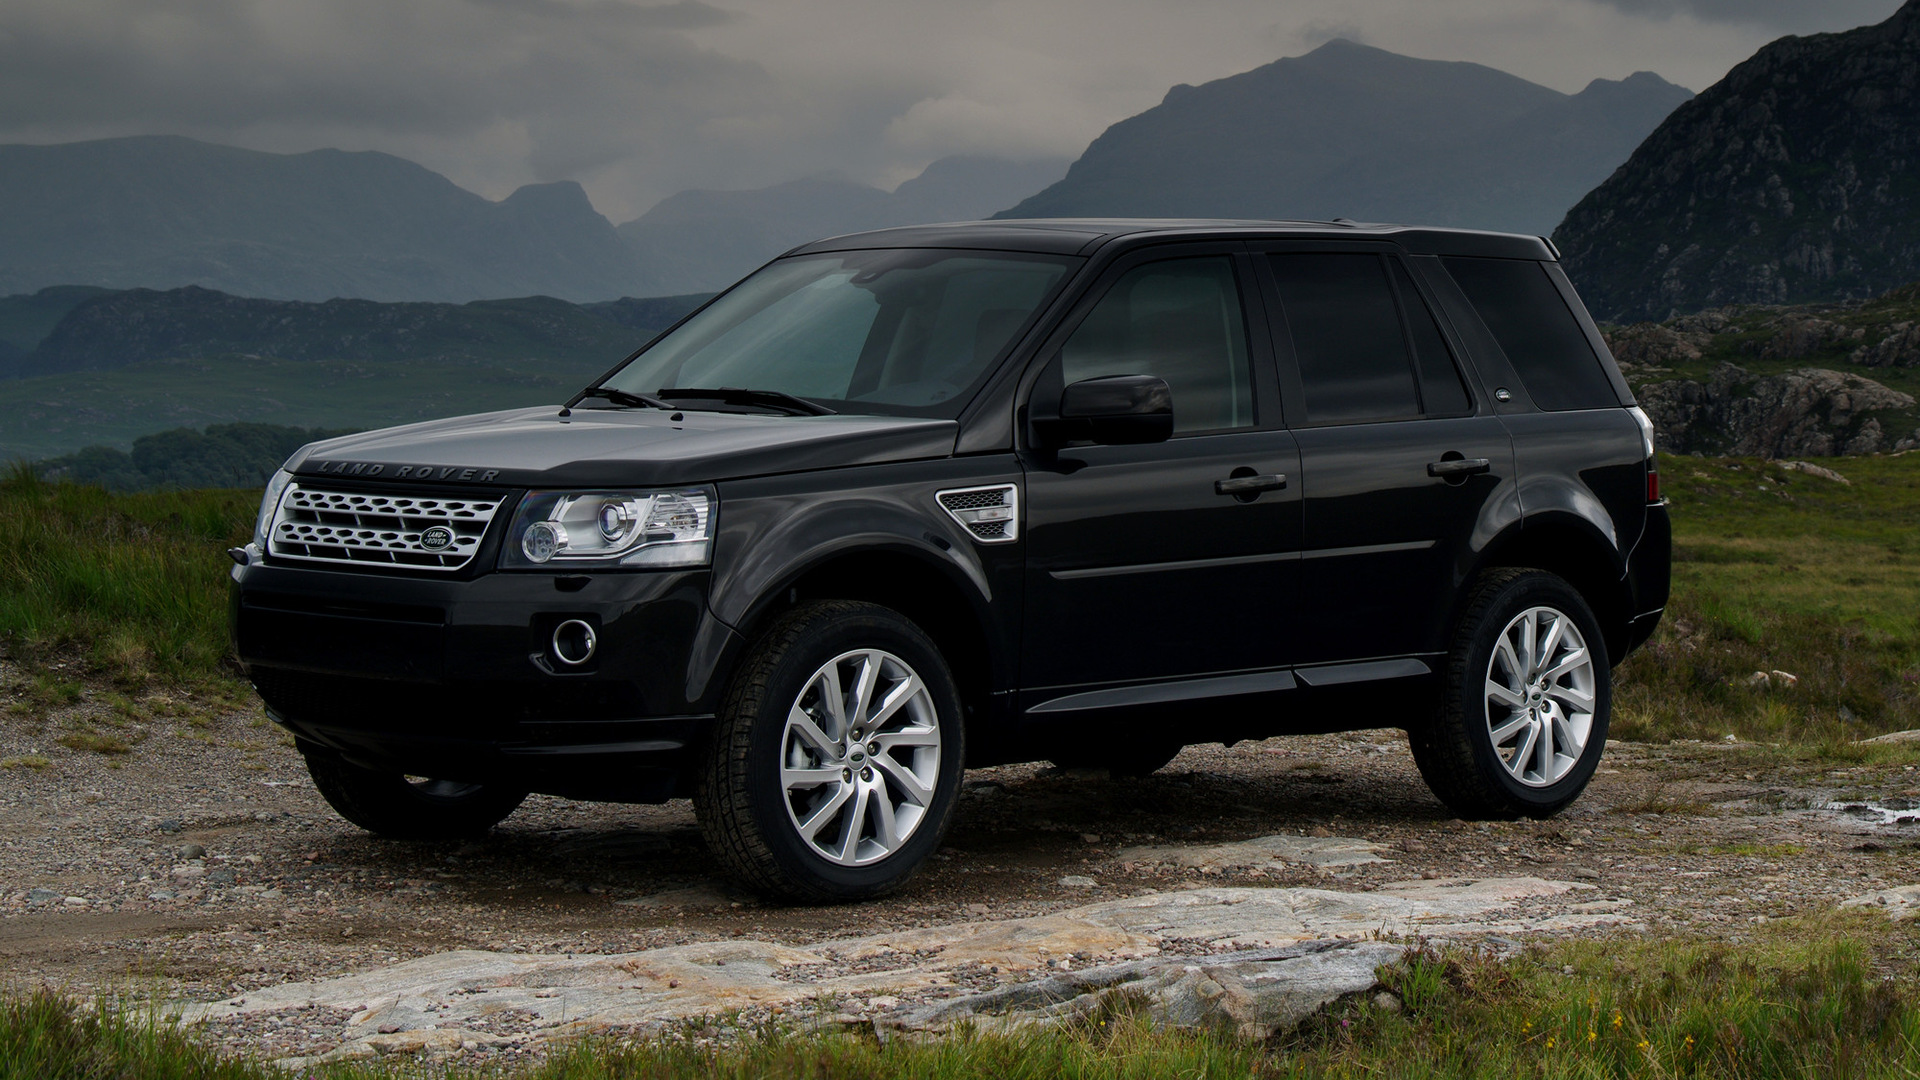 2012 land rover freelander 2 hse wallpapers and hd images car pixel. Black Bedroom Furniture Sets. Home Design Ideas